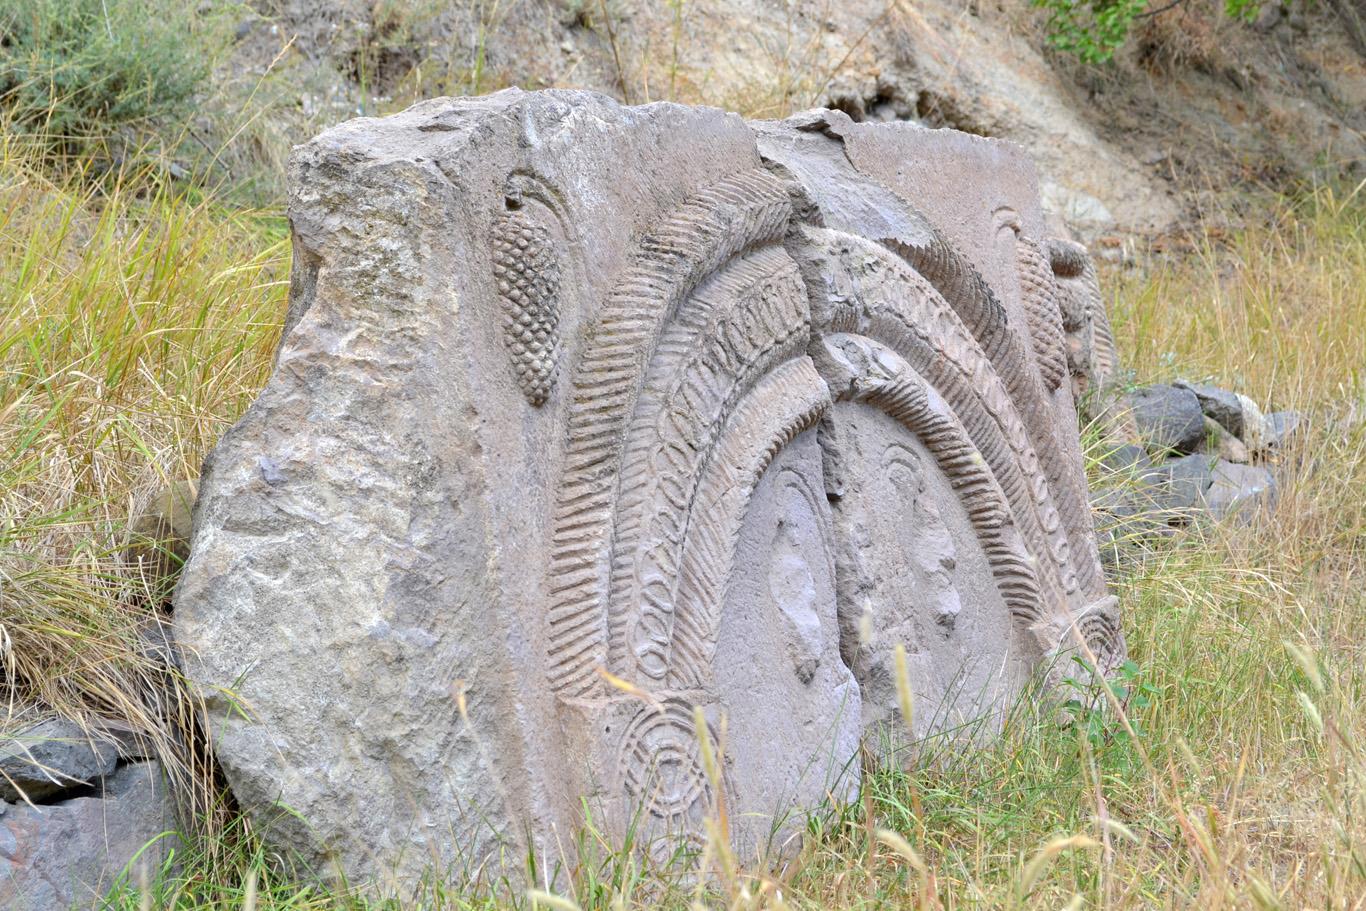 Beautifully decorated stones